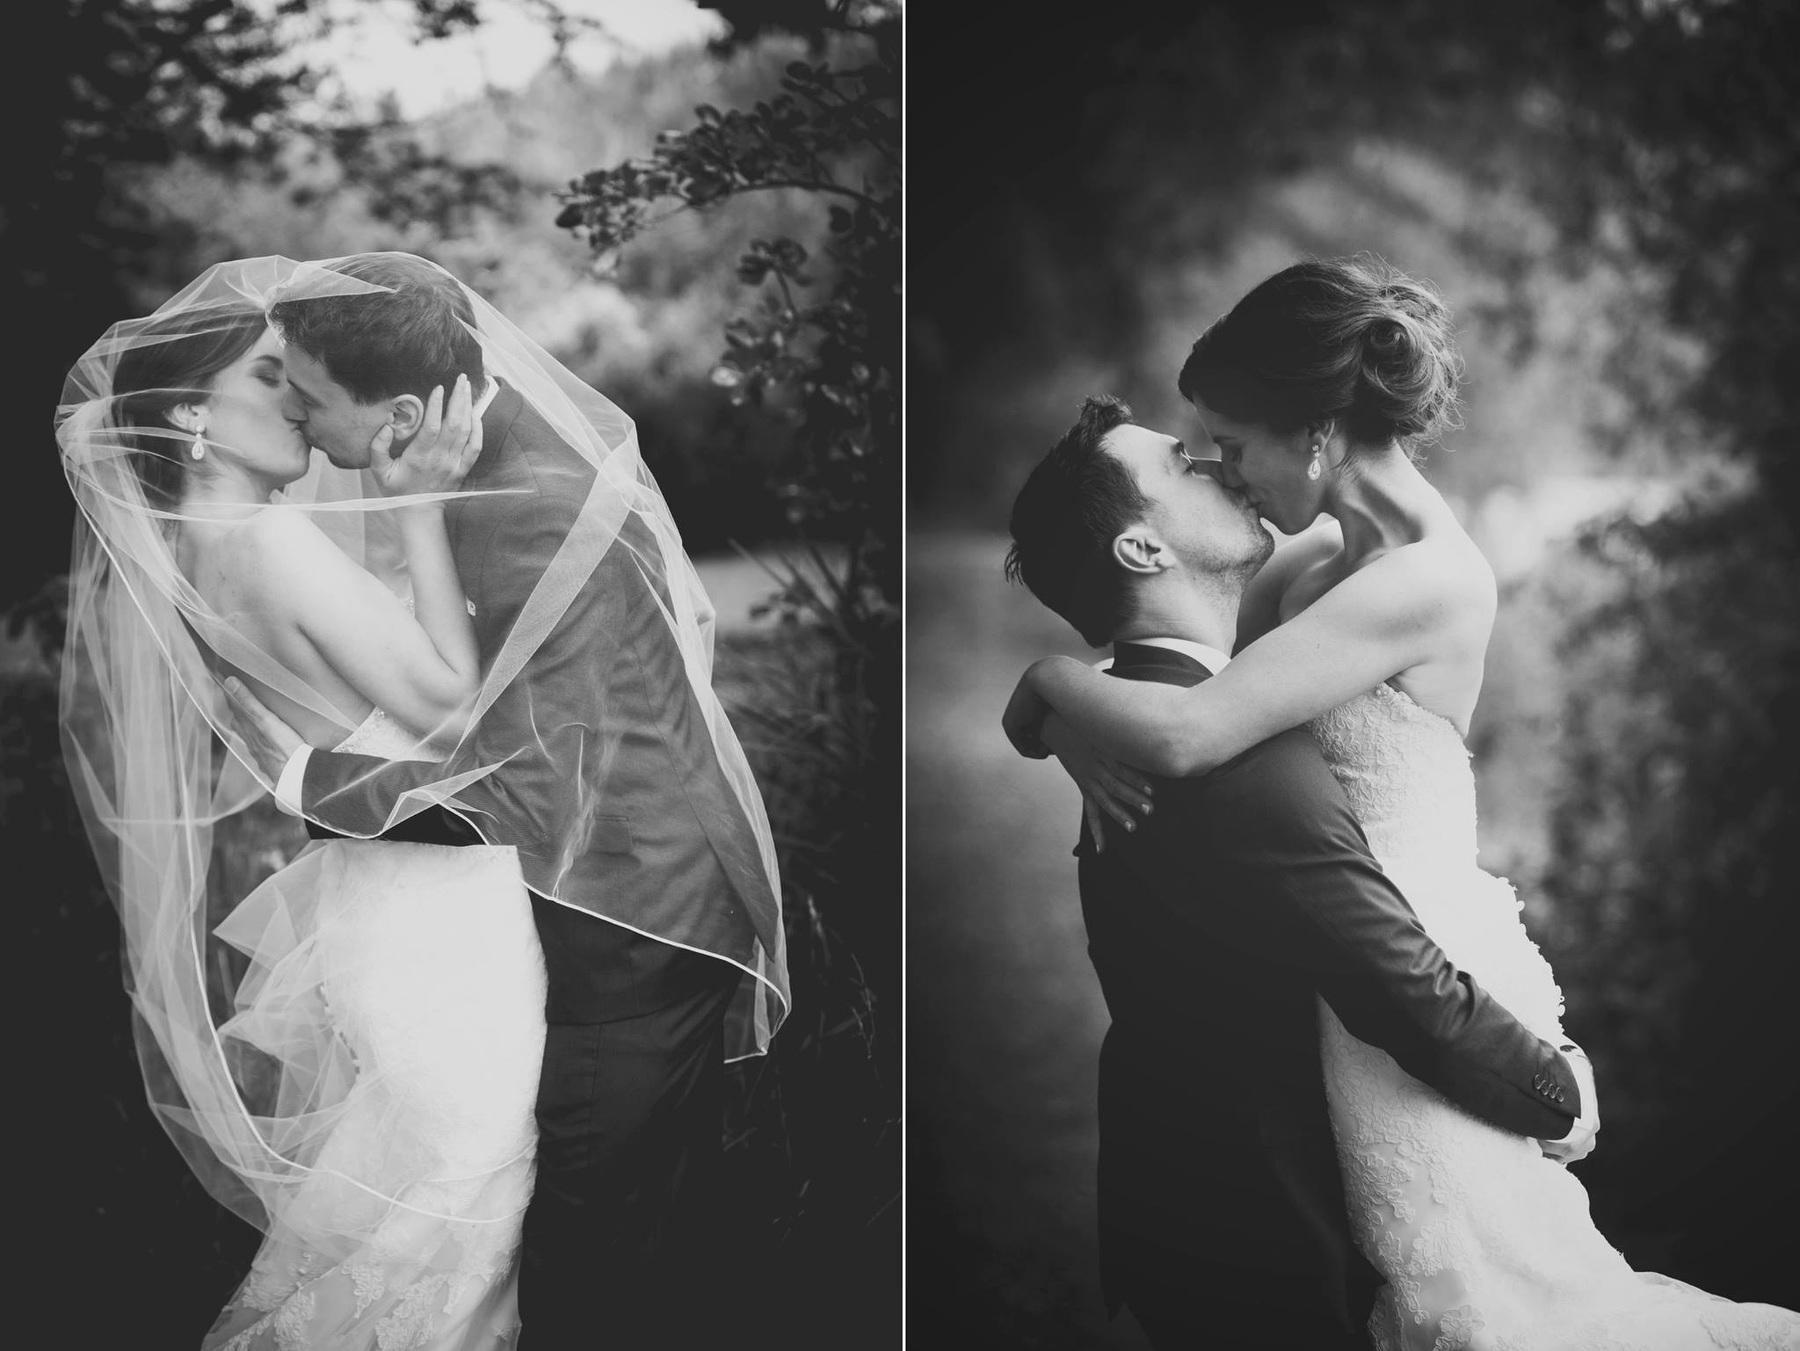 wedding-photogrpaher-kapiti-michelle-11A.JPG